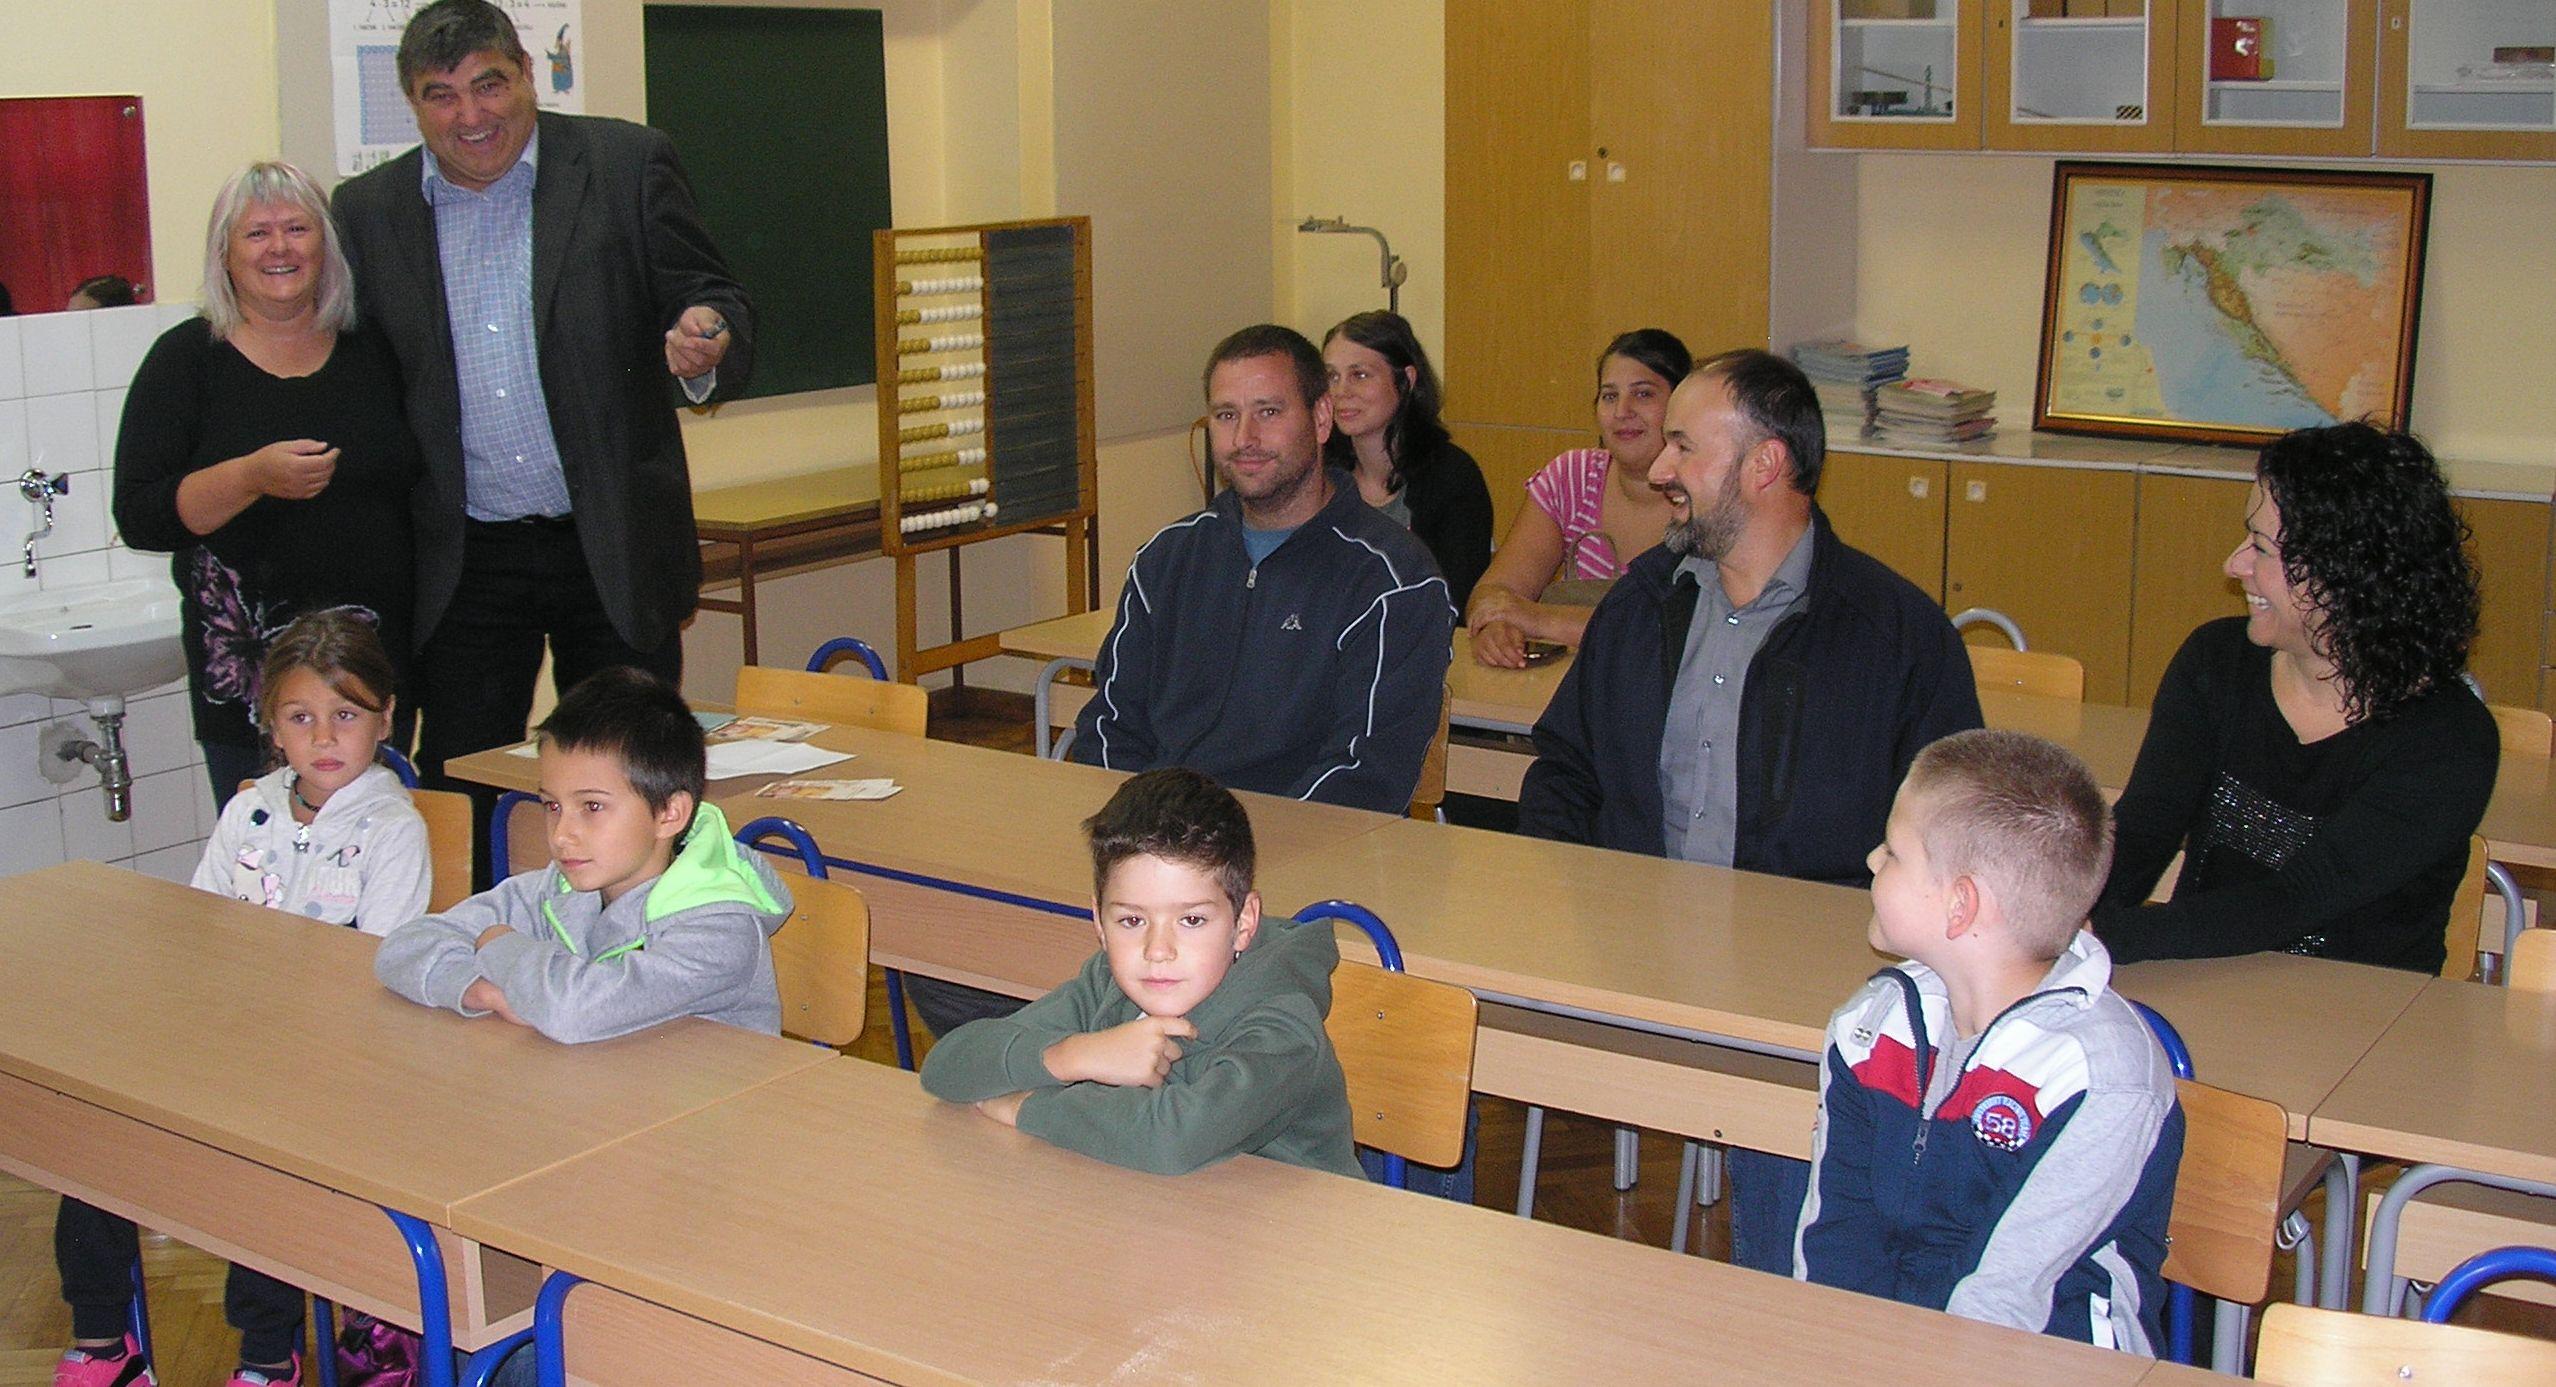 Načelnik Damir Grgurić obradovao je skradske prvašiće posjetom, a njihove roditelje s novčanom pomoći / Foto V. PINTAR